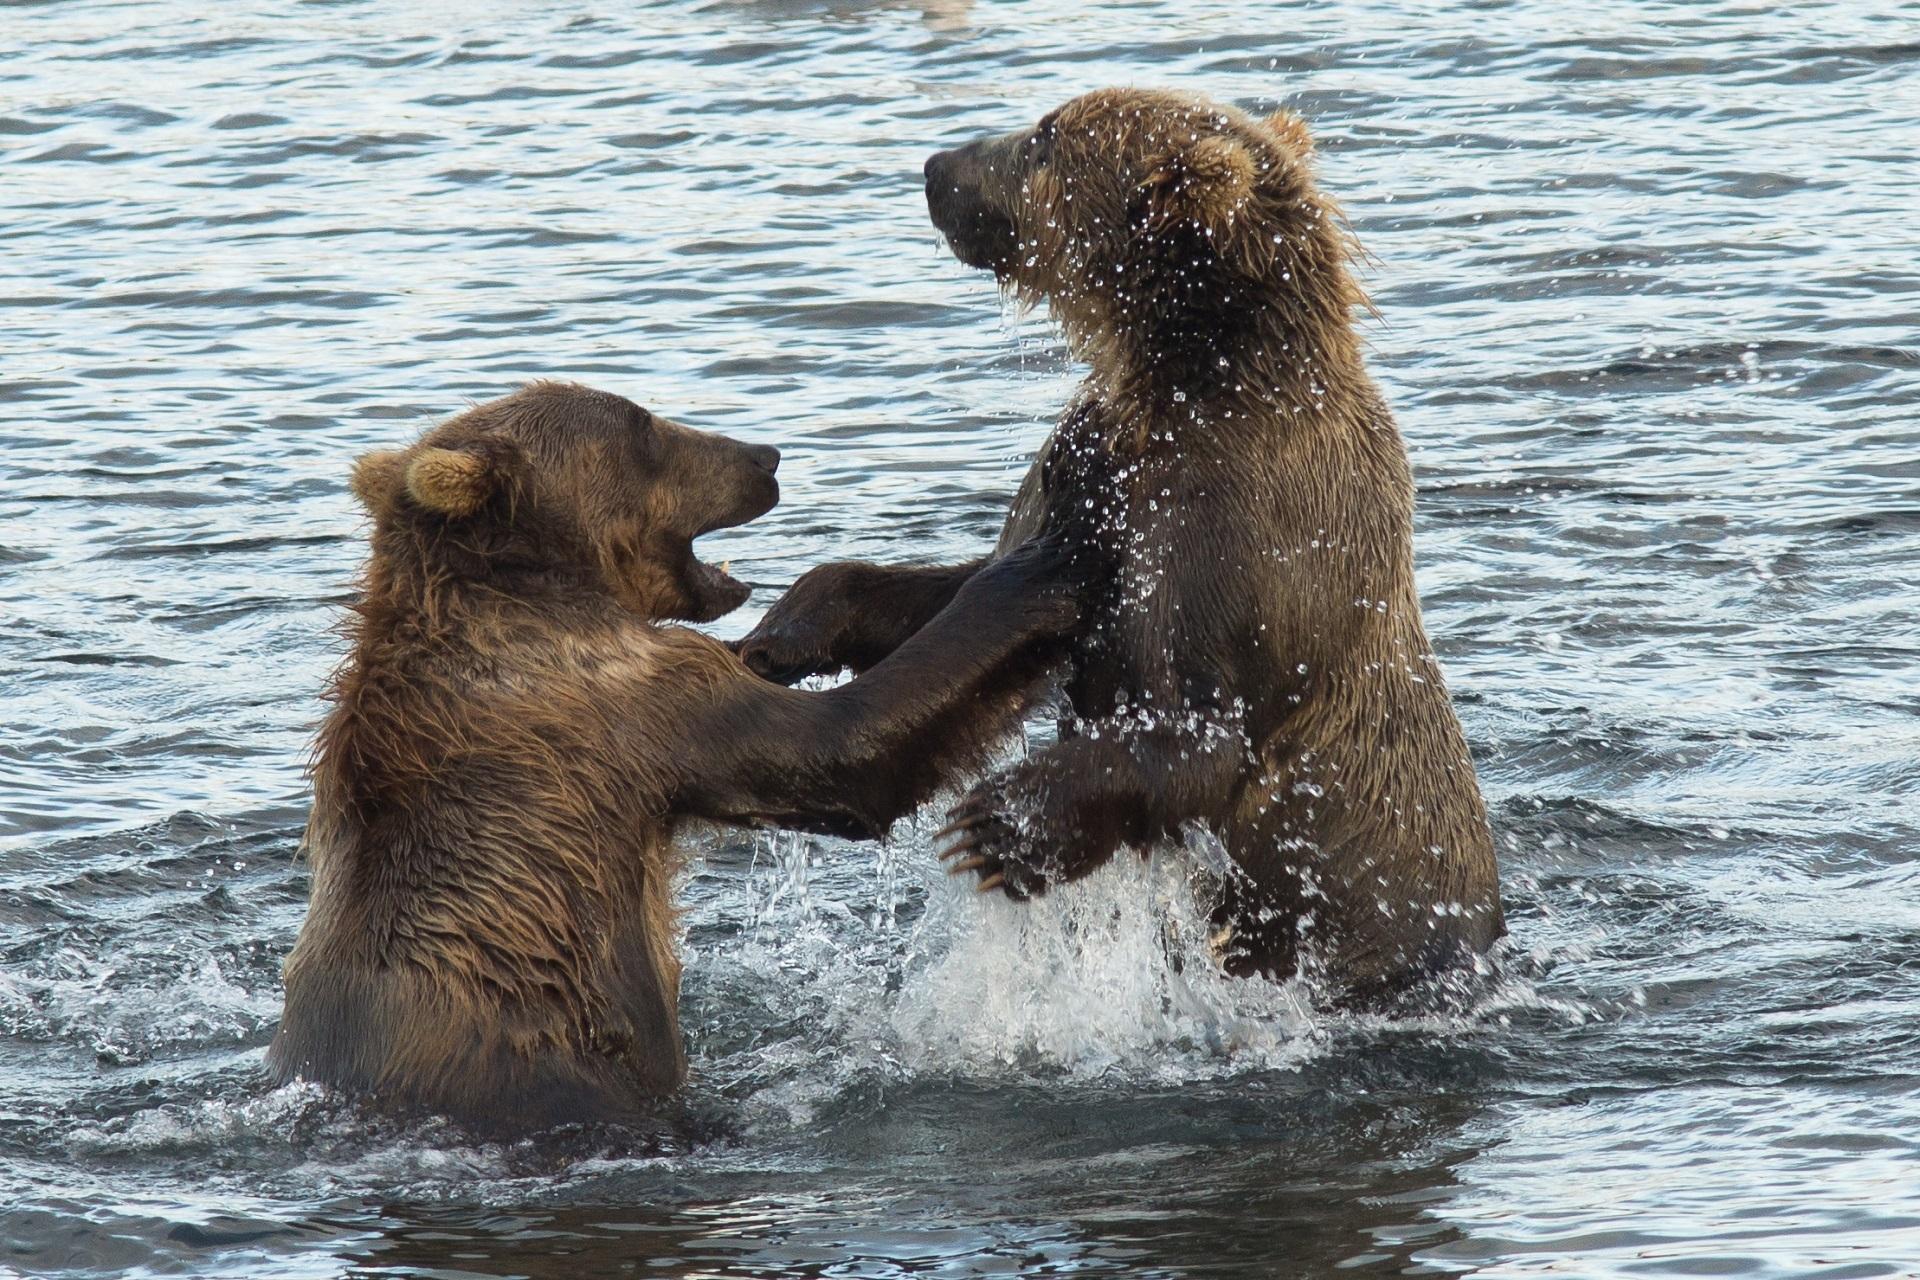 Kodiak Brown Bears, Animal, Bear, Brown, Fierce, HQ Photo